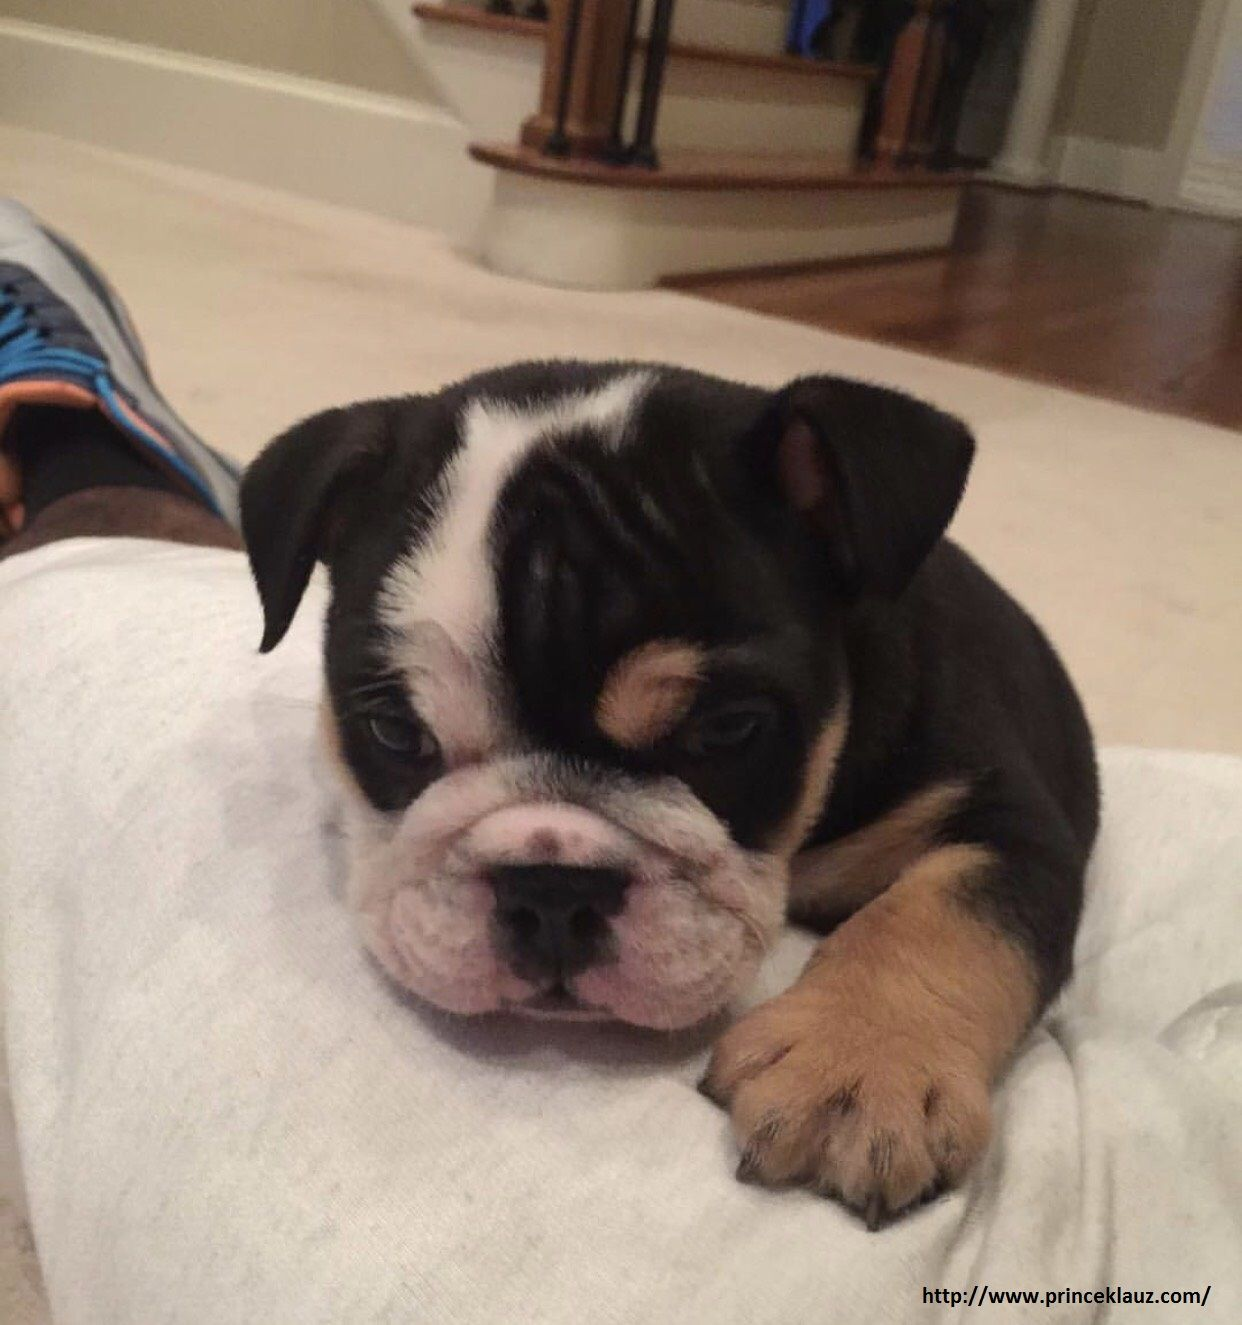 Black Tri Bulldog Puppies Price Starts From 4500 Usd To 7500 Usd